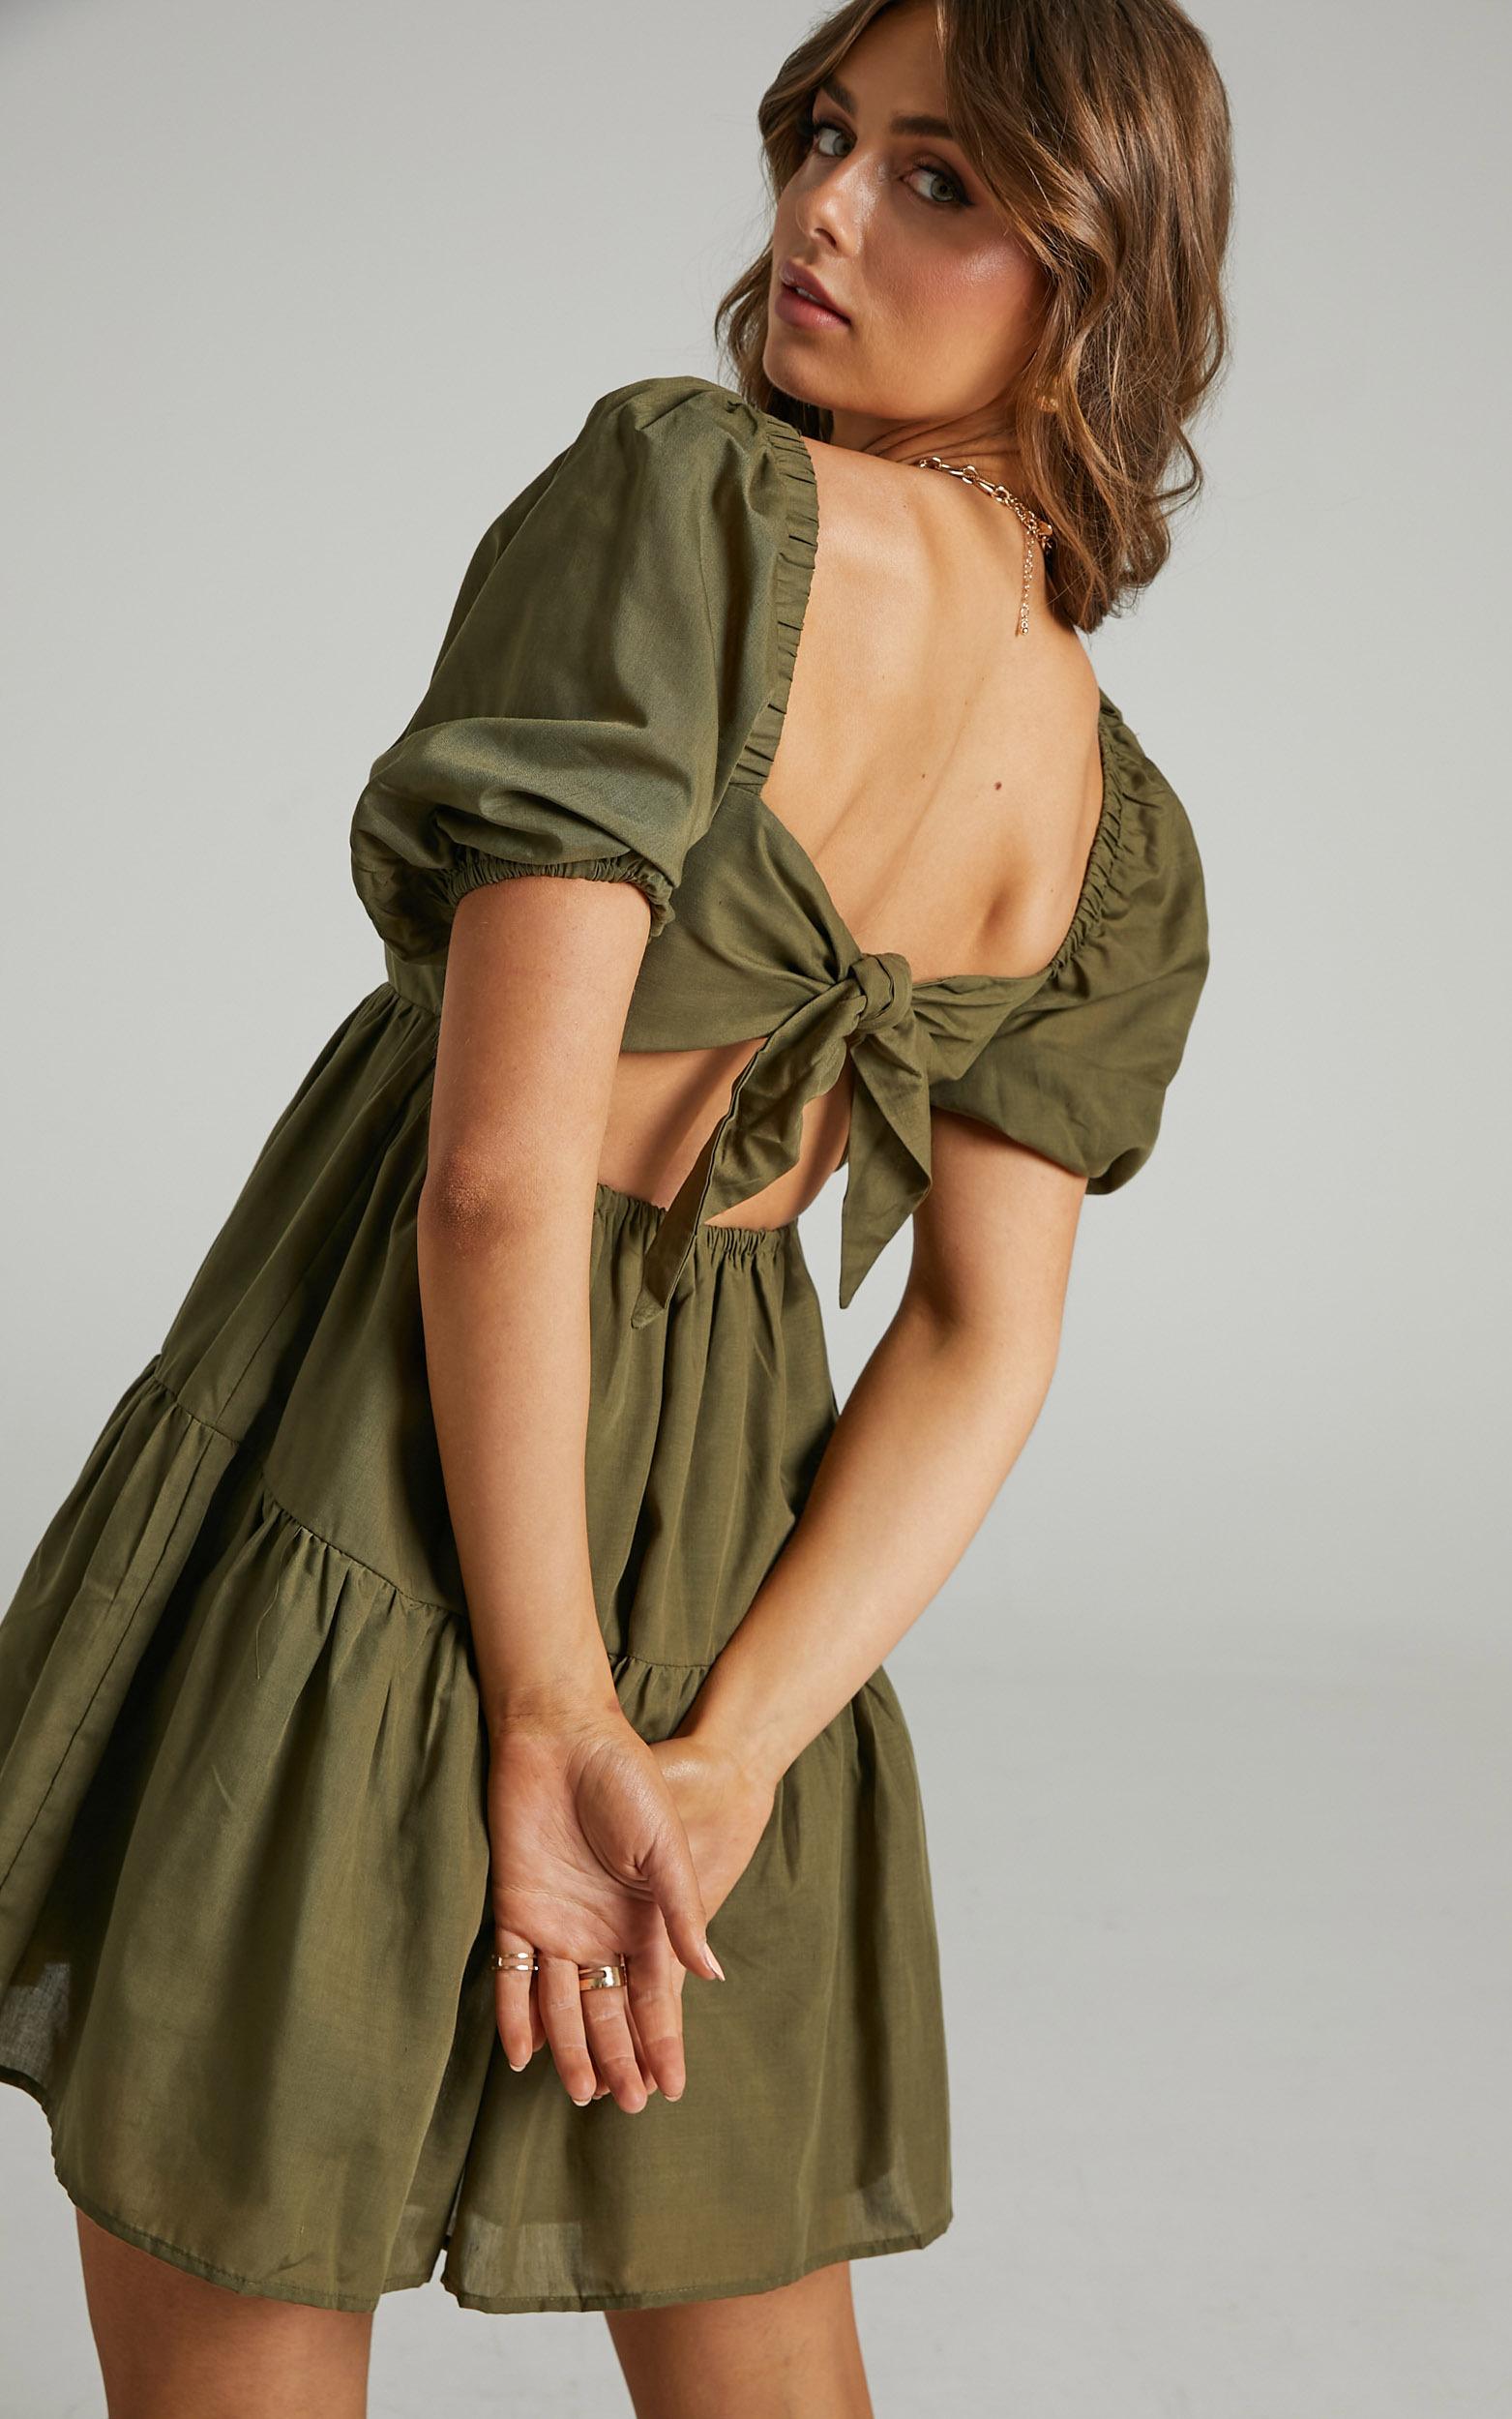 Hazel Short Sleeve Tiered Tie Back Smock Dress in Khaki - 06, GRN1, hi-res image number null